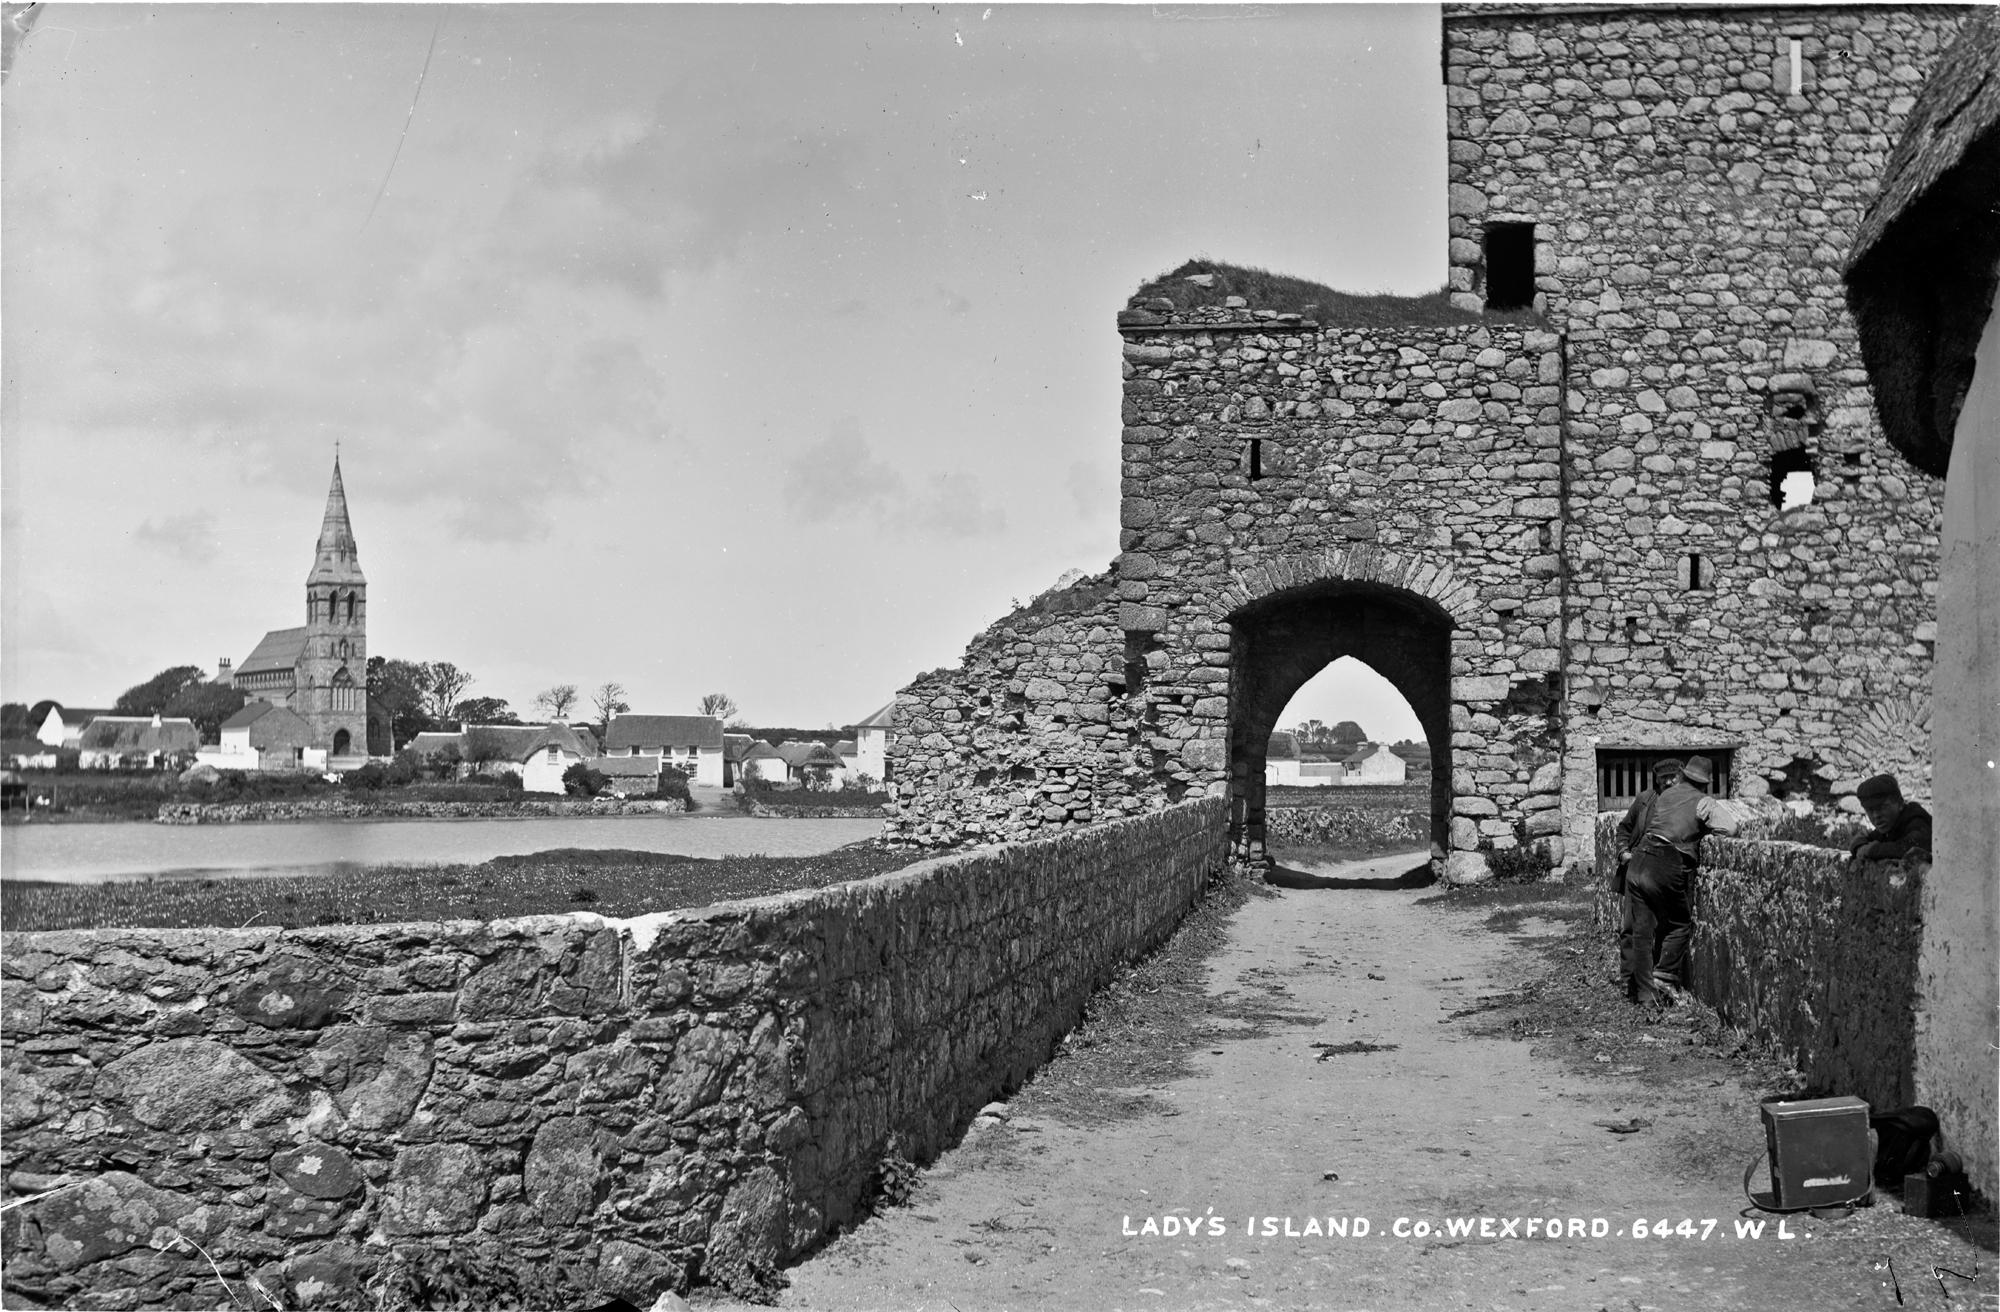 Lady's Island, Co. Wexford